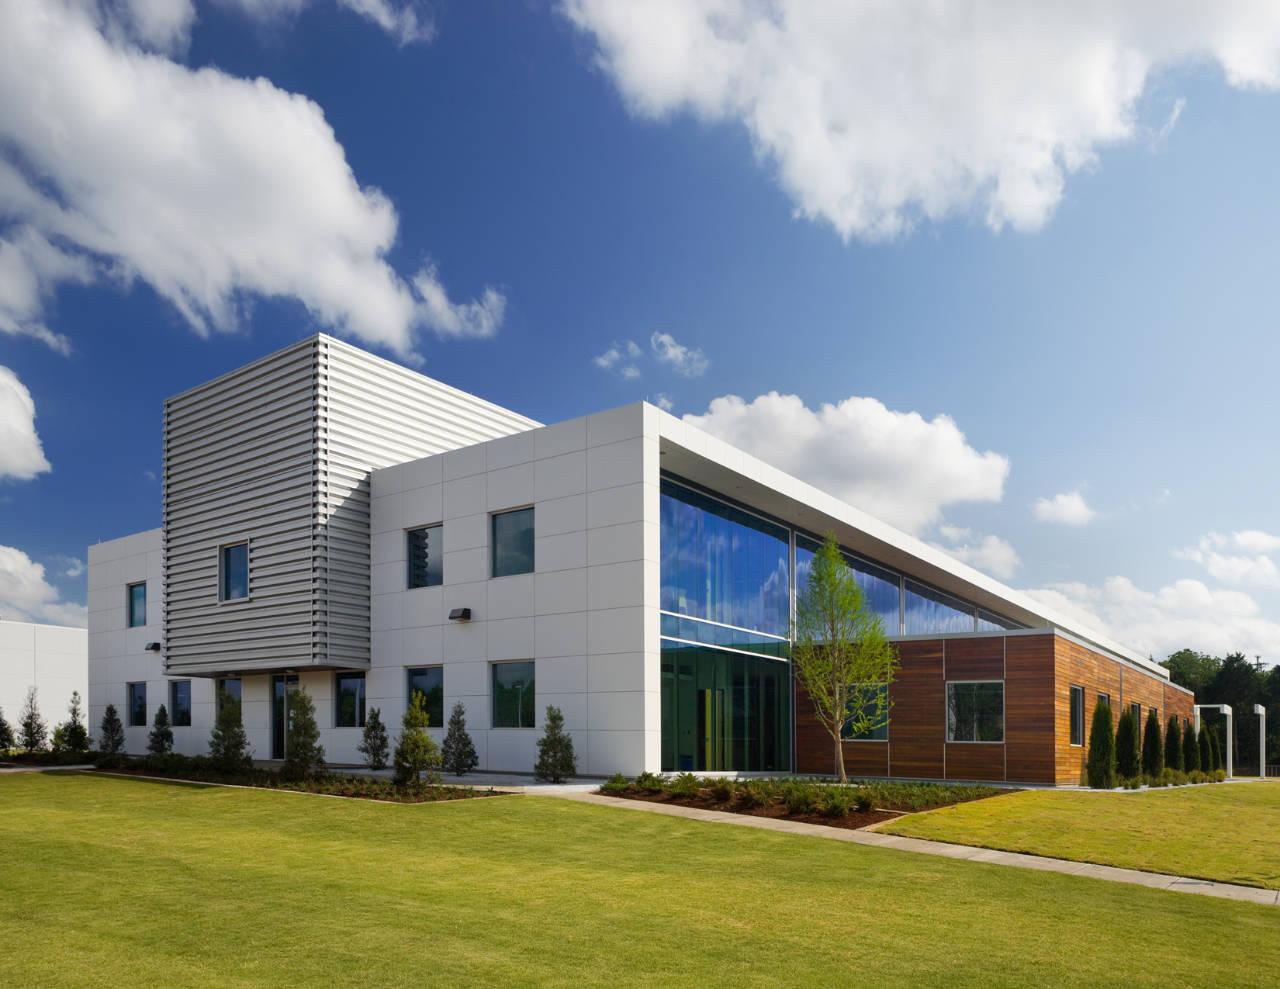 Franke / Hastings Architecture Associates